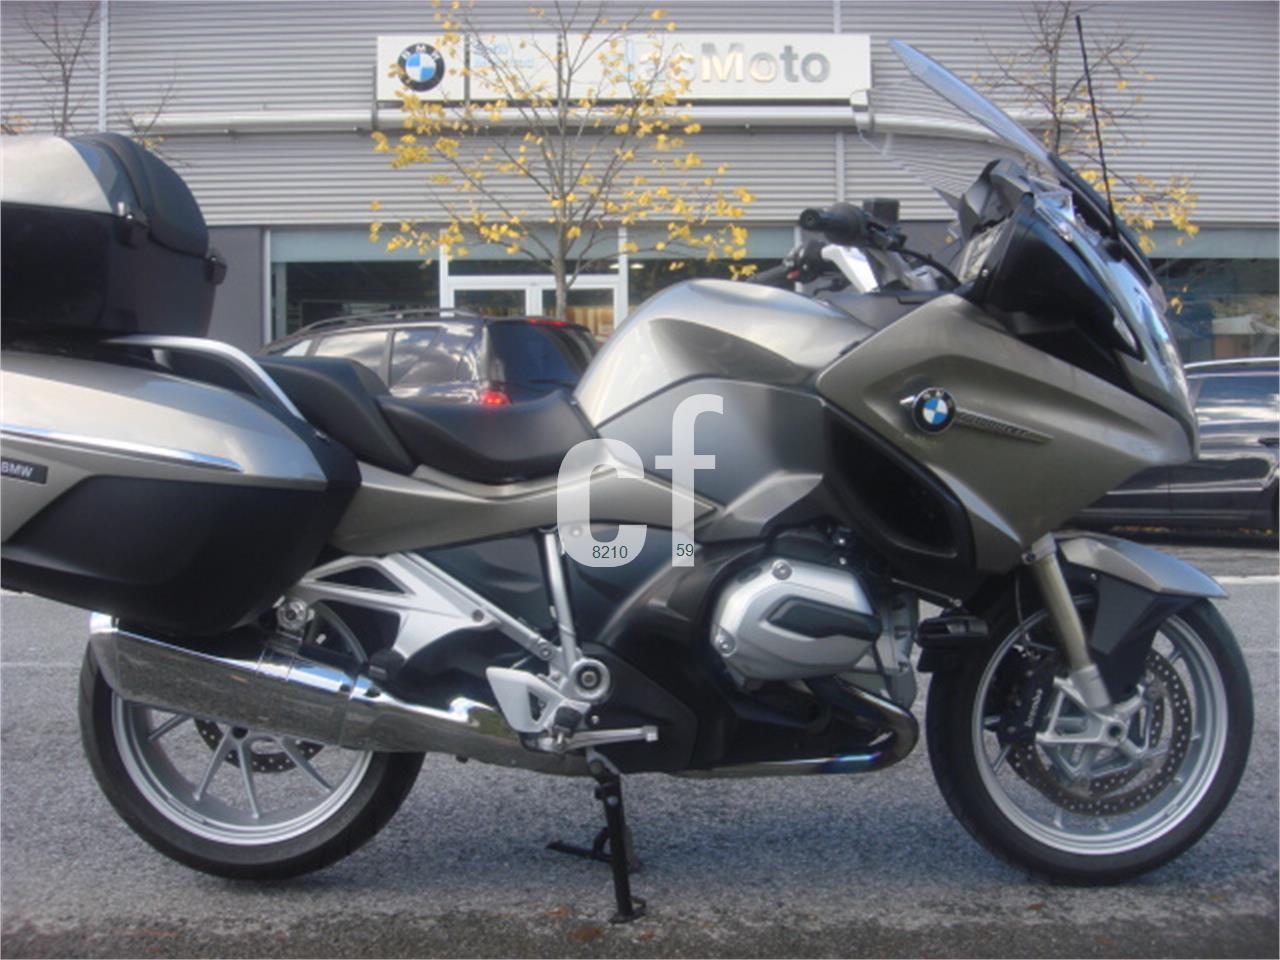 bmw r 1200 rt de moto segunda mano en guipzcoa 6000 km. Black Bedroom Furniture Sets. Home Design Ideas